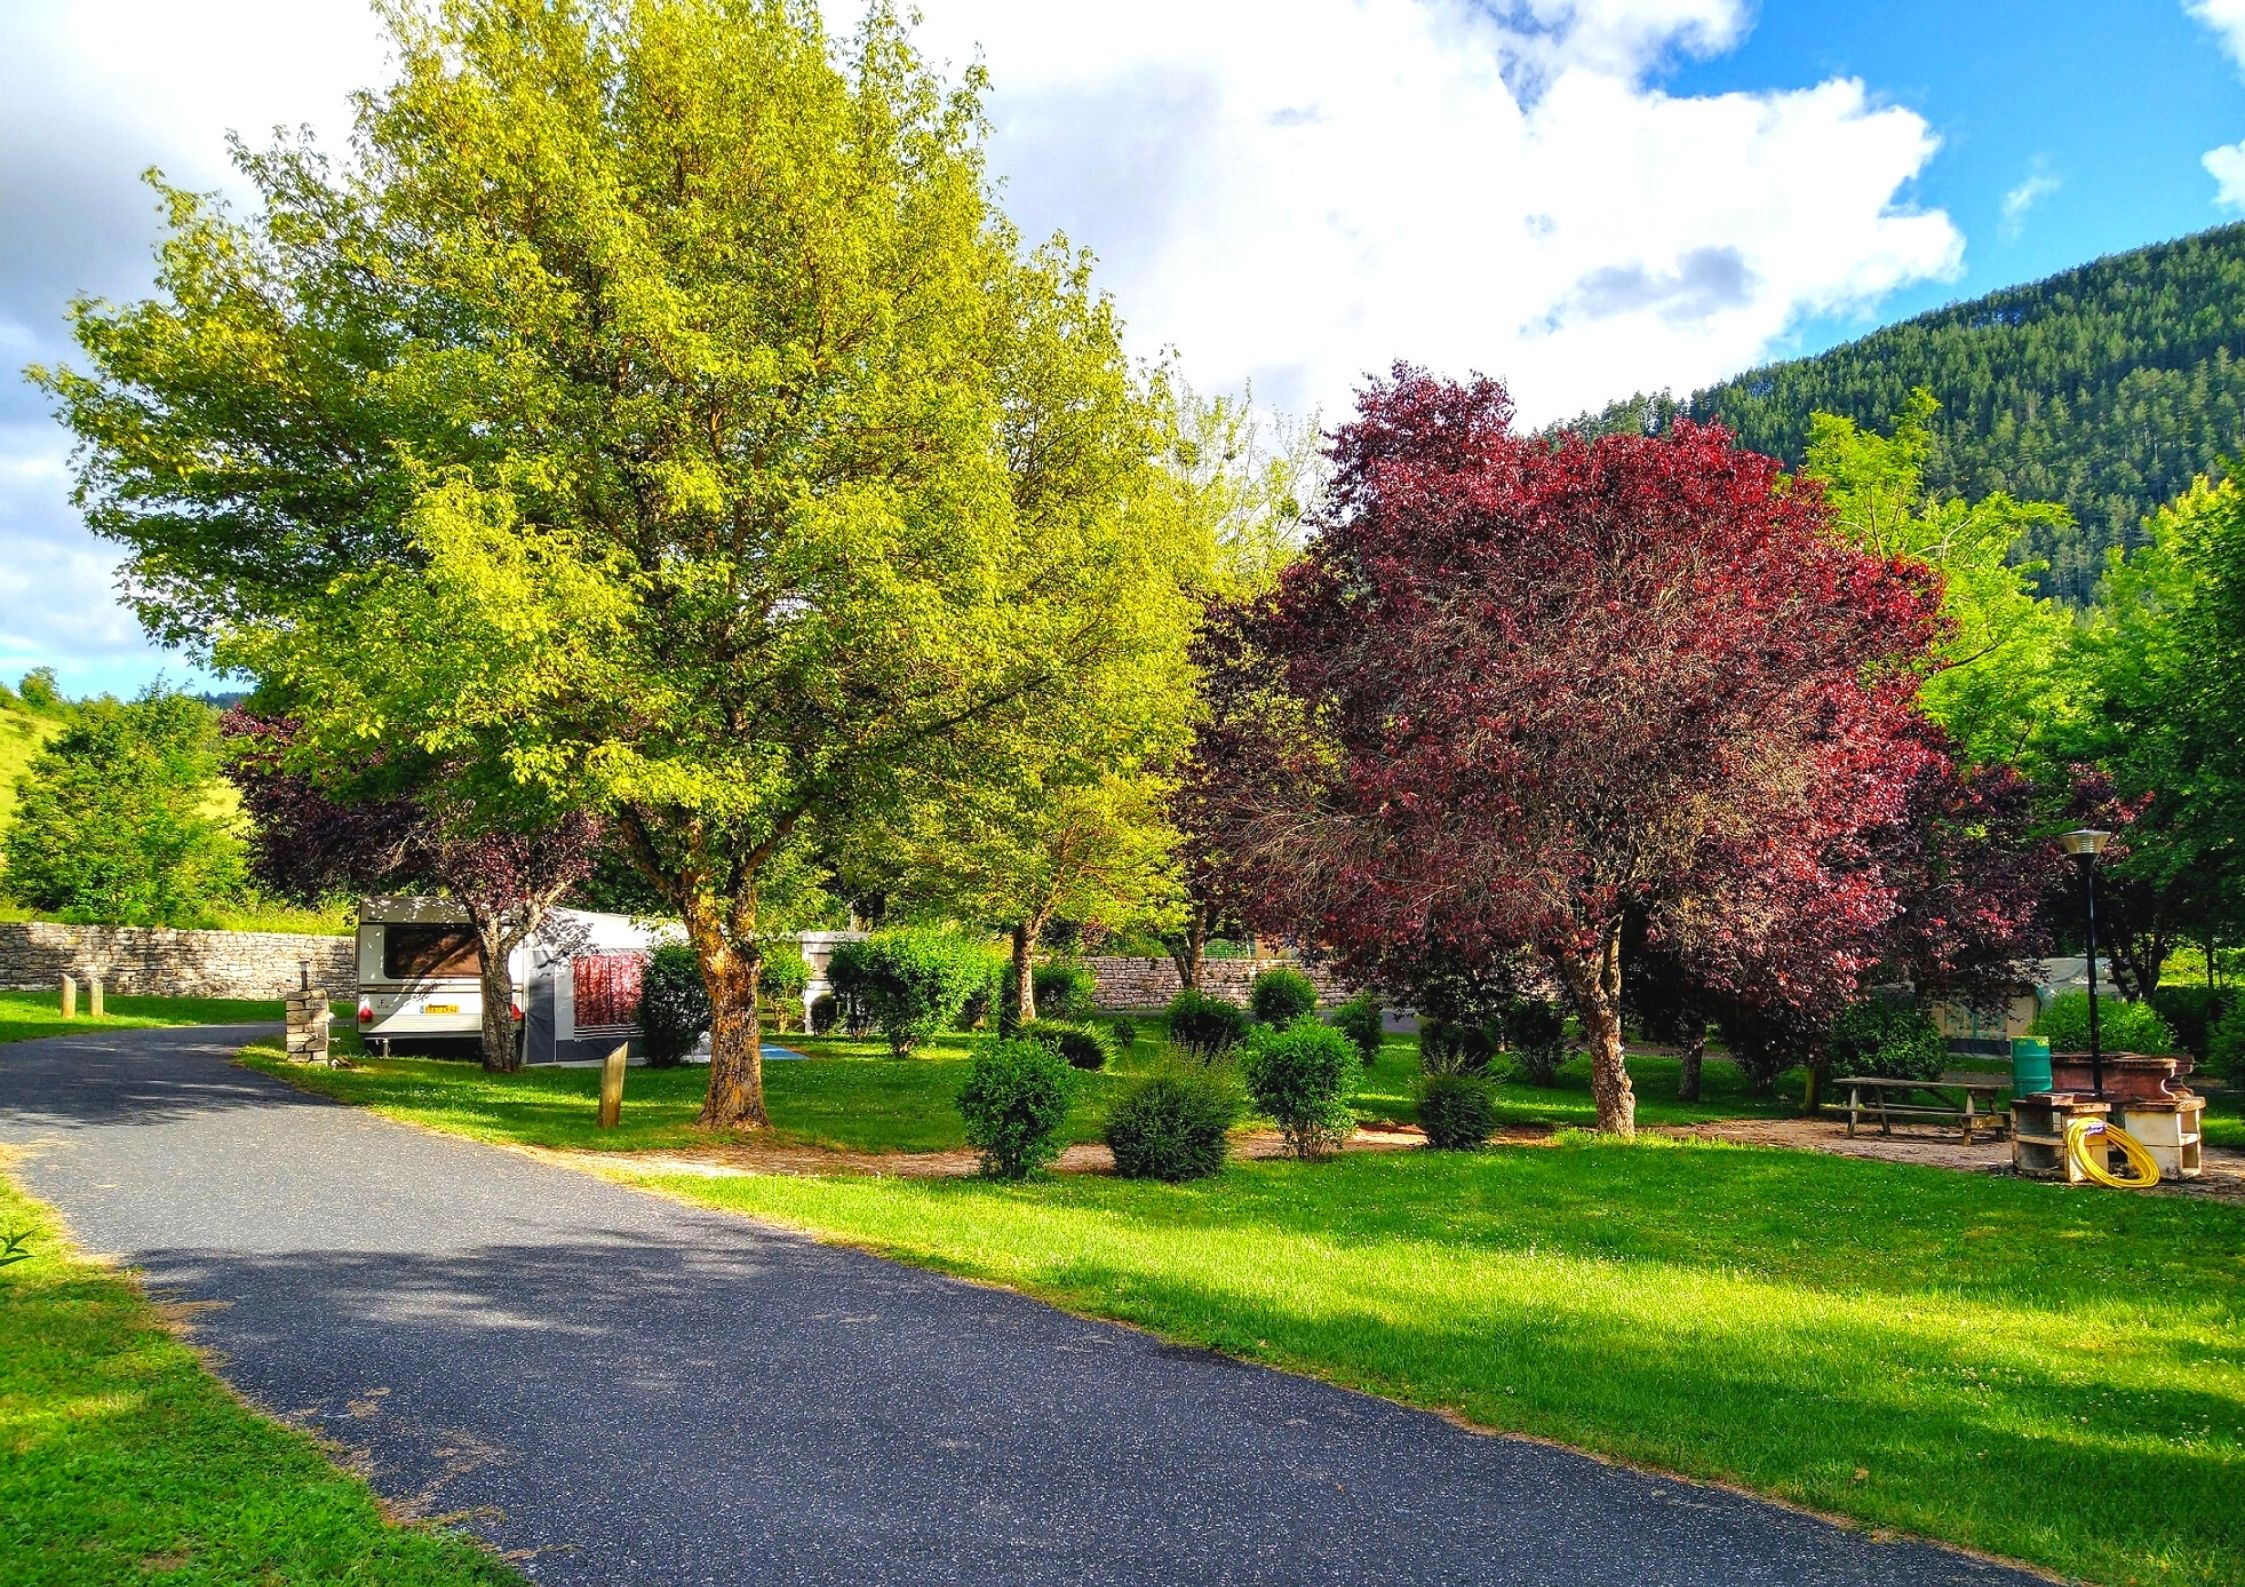 Le camping de Chanac verdoyant